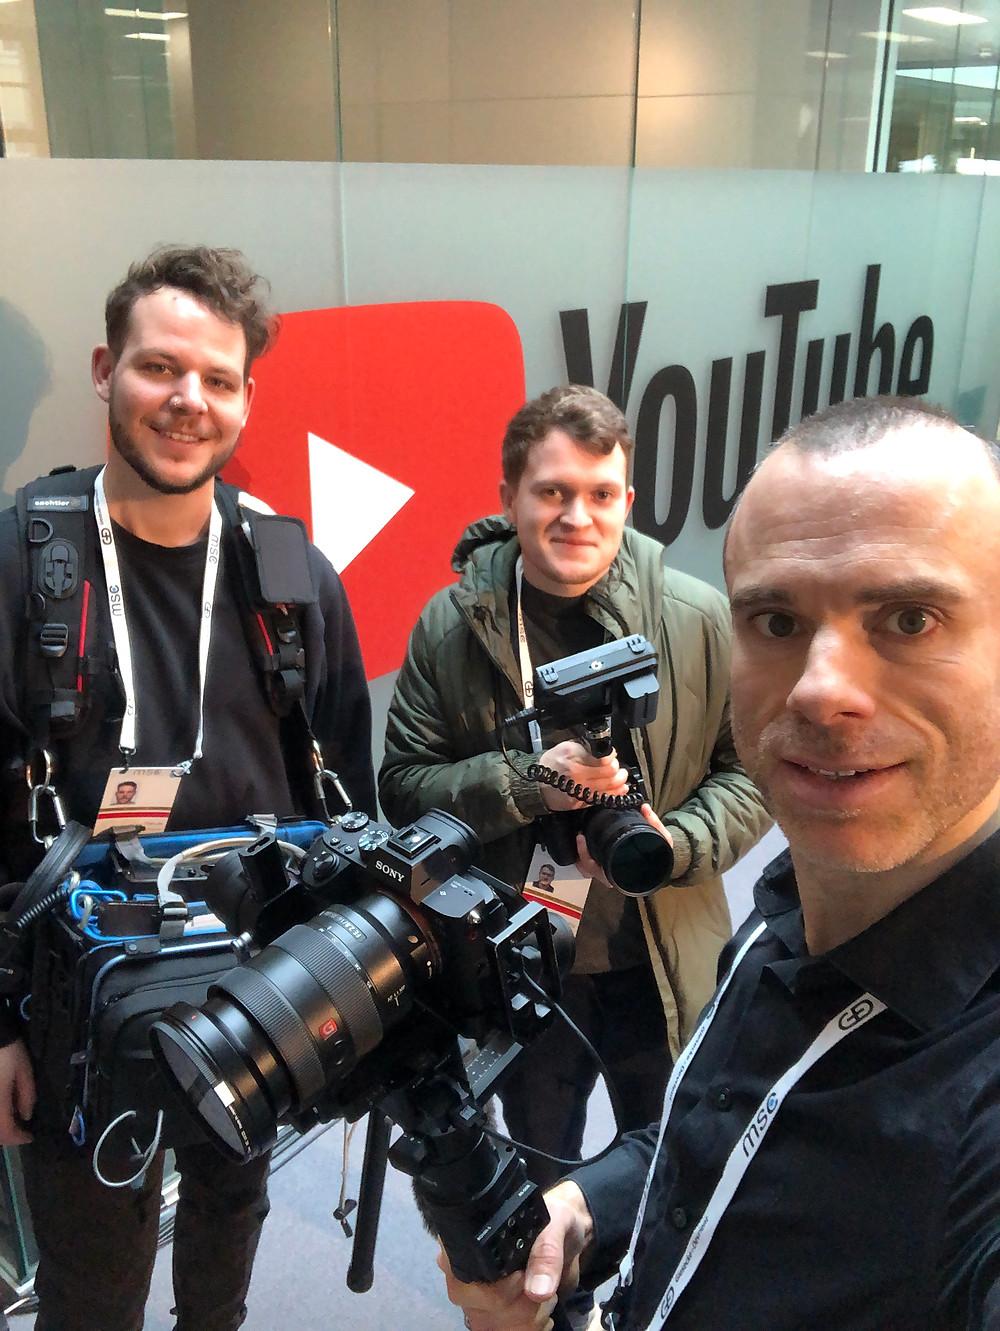 Videoproduktion_Dreharbeiten MSC 2020_02